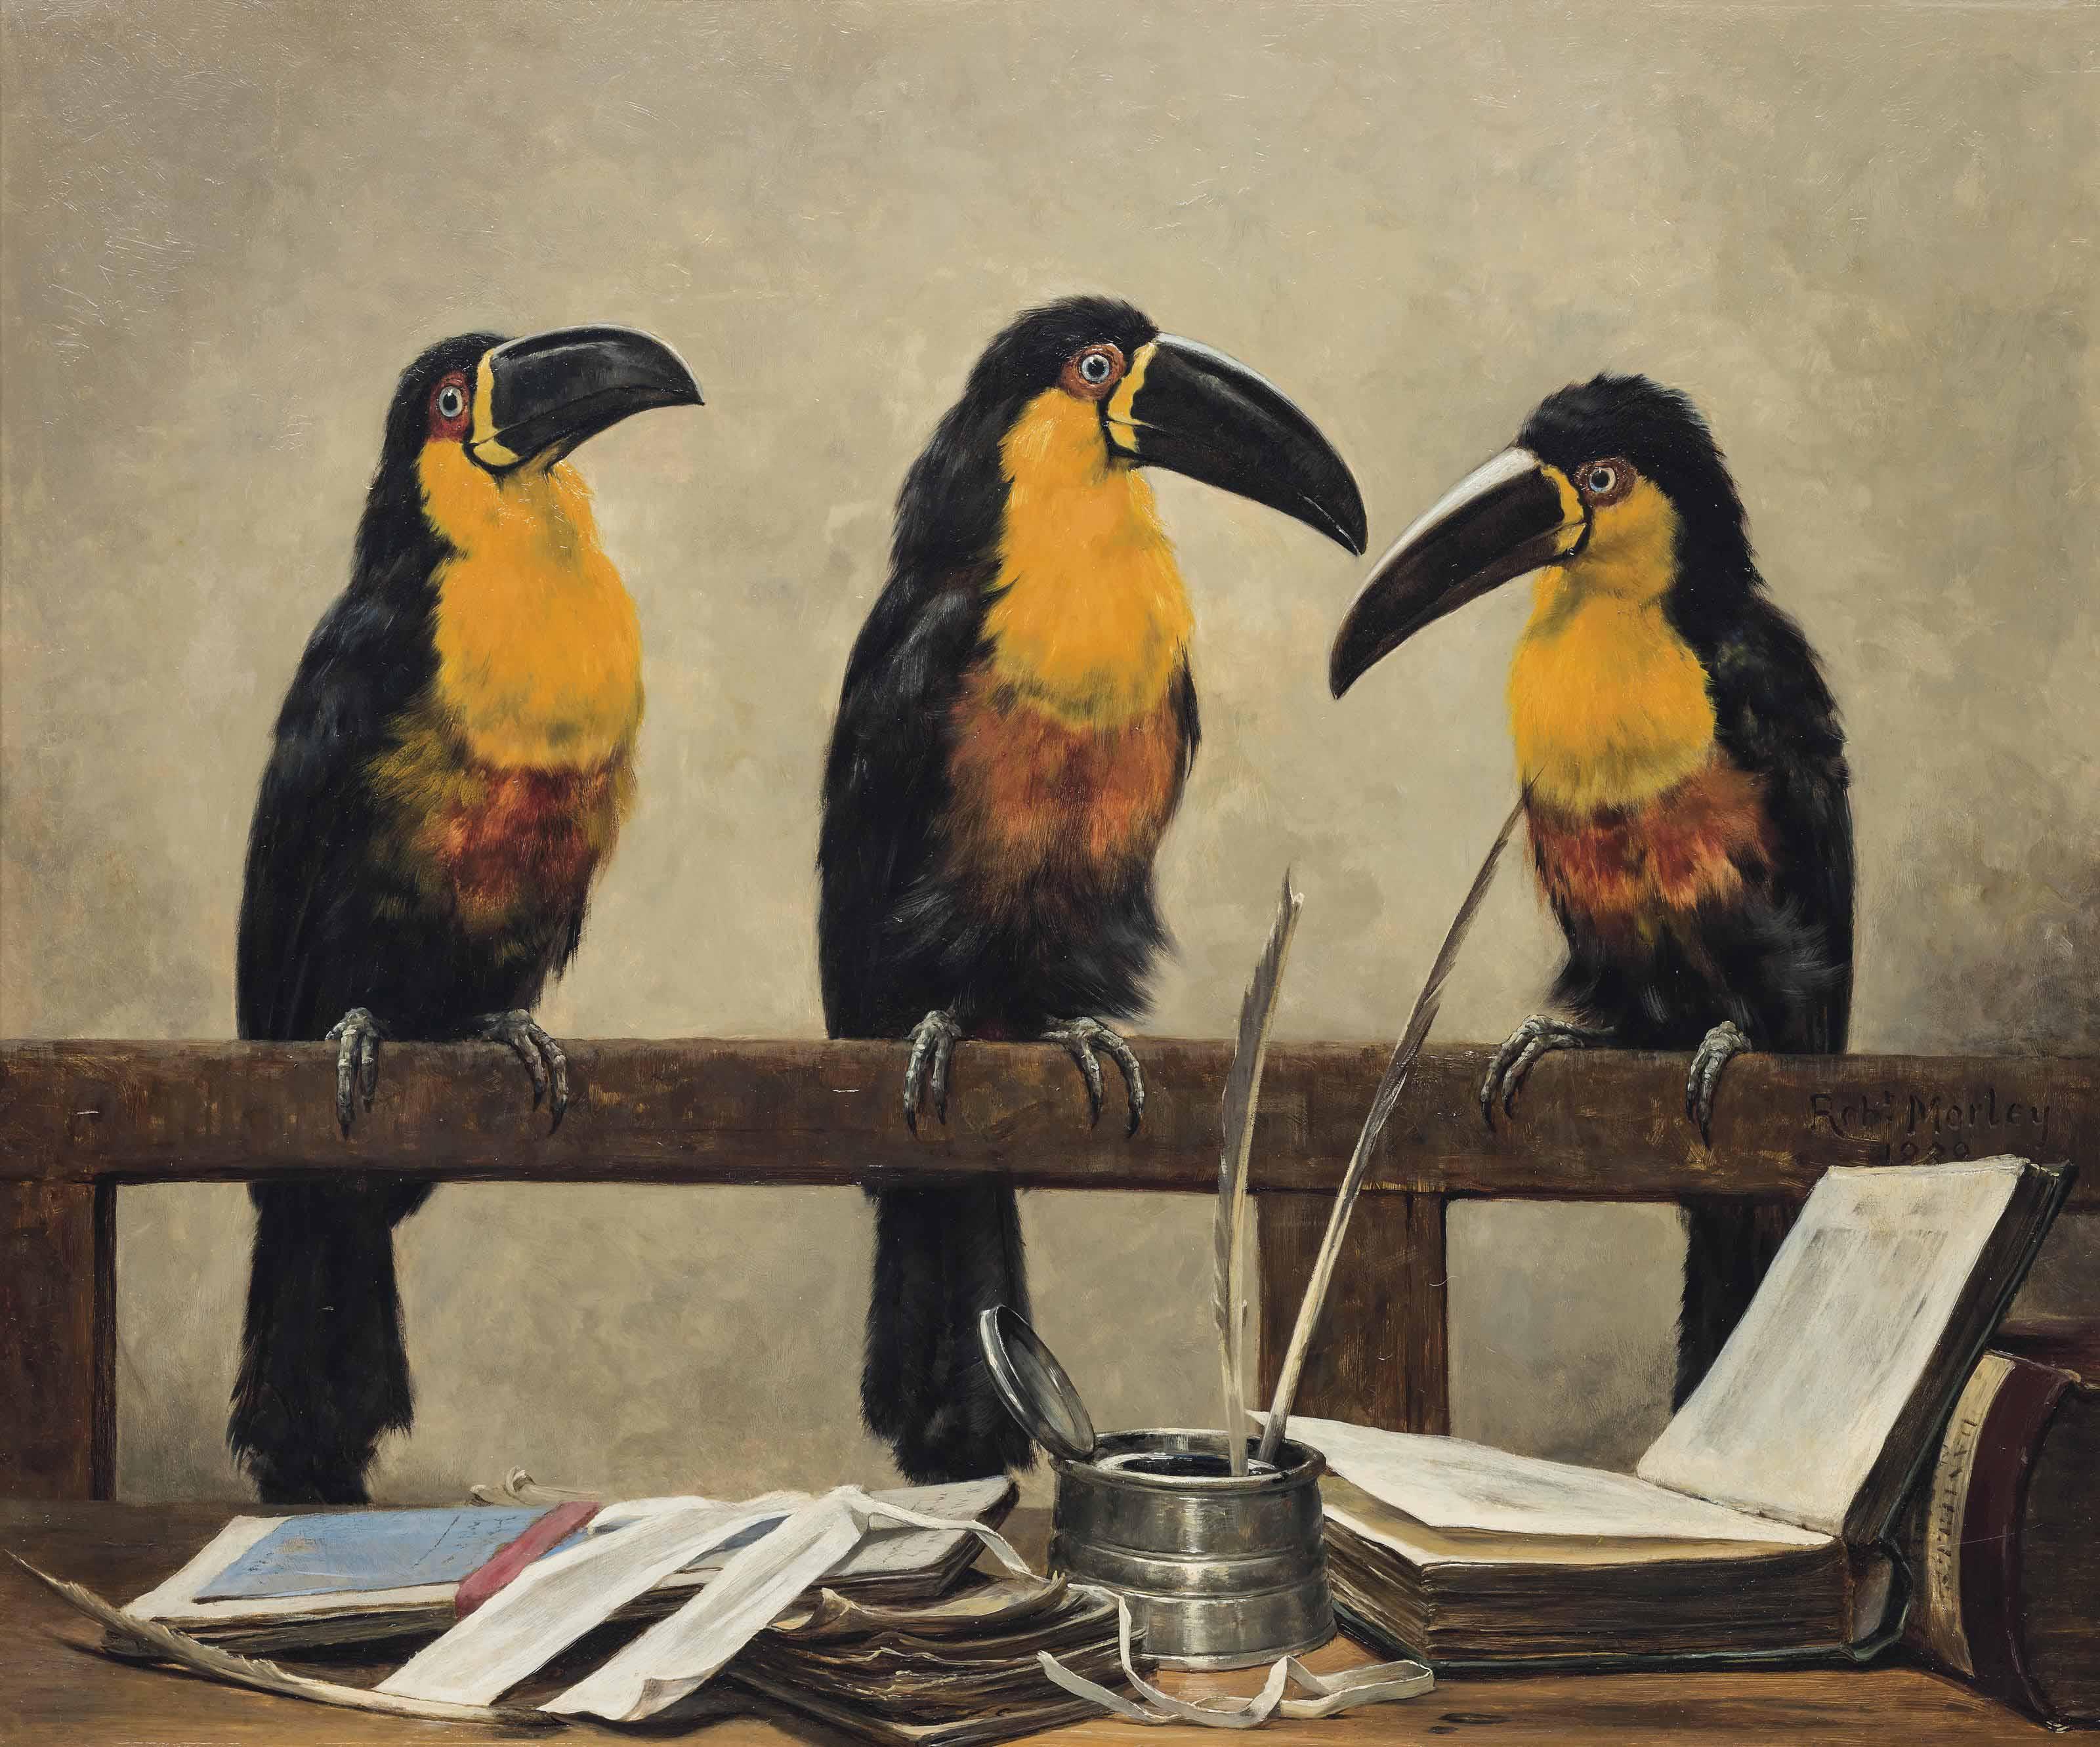 The literary critics